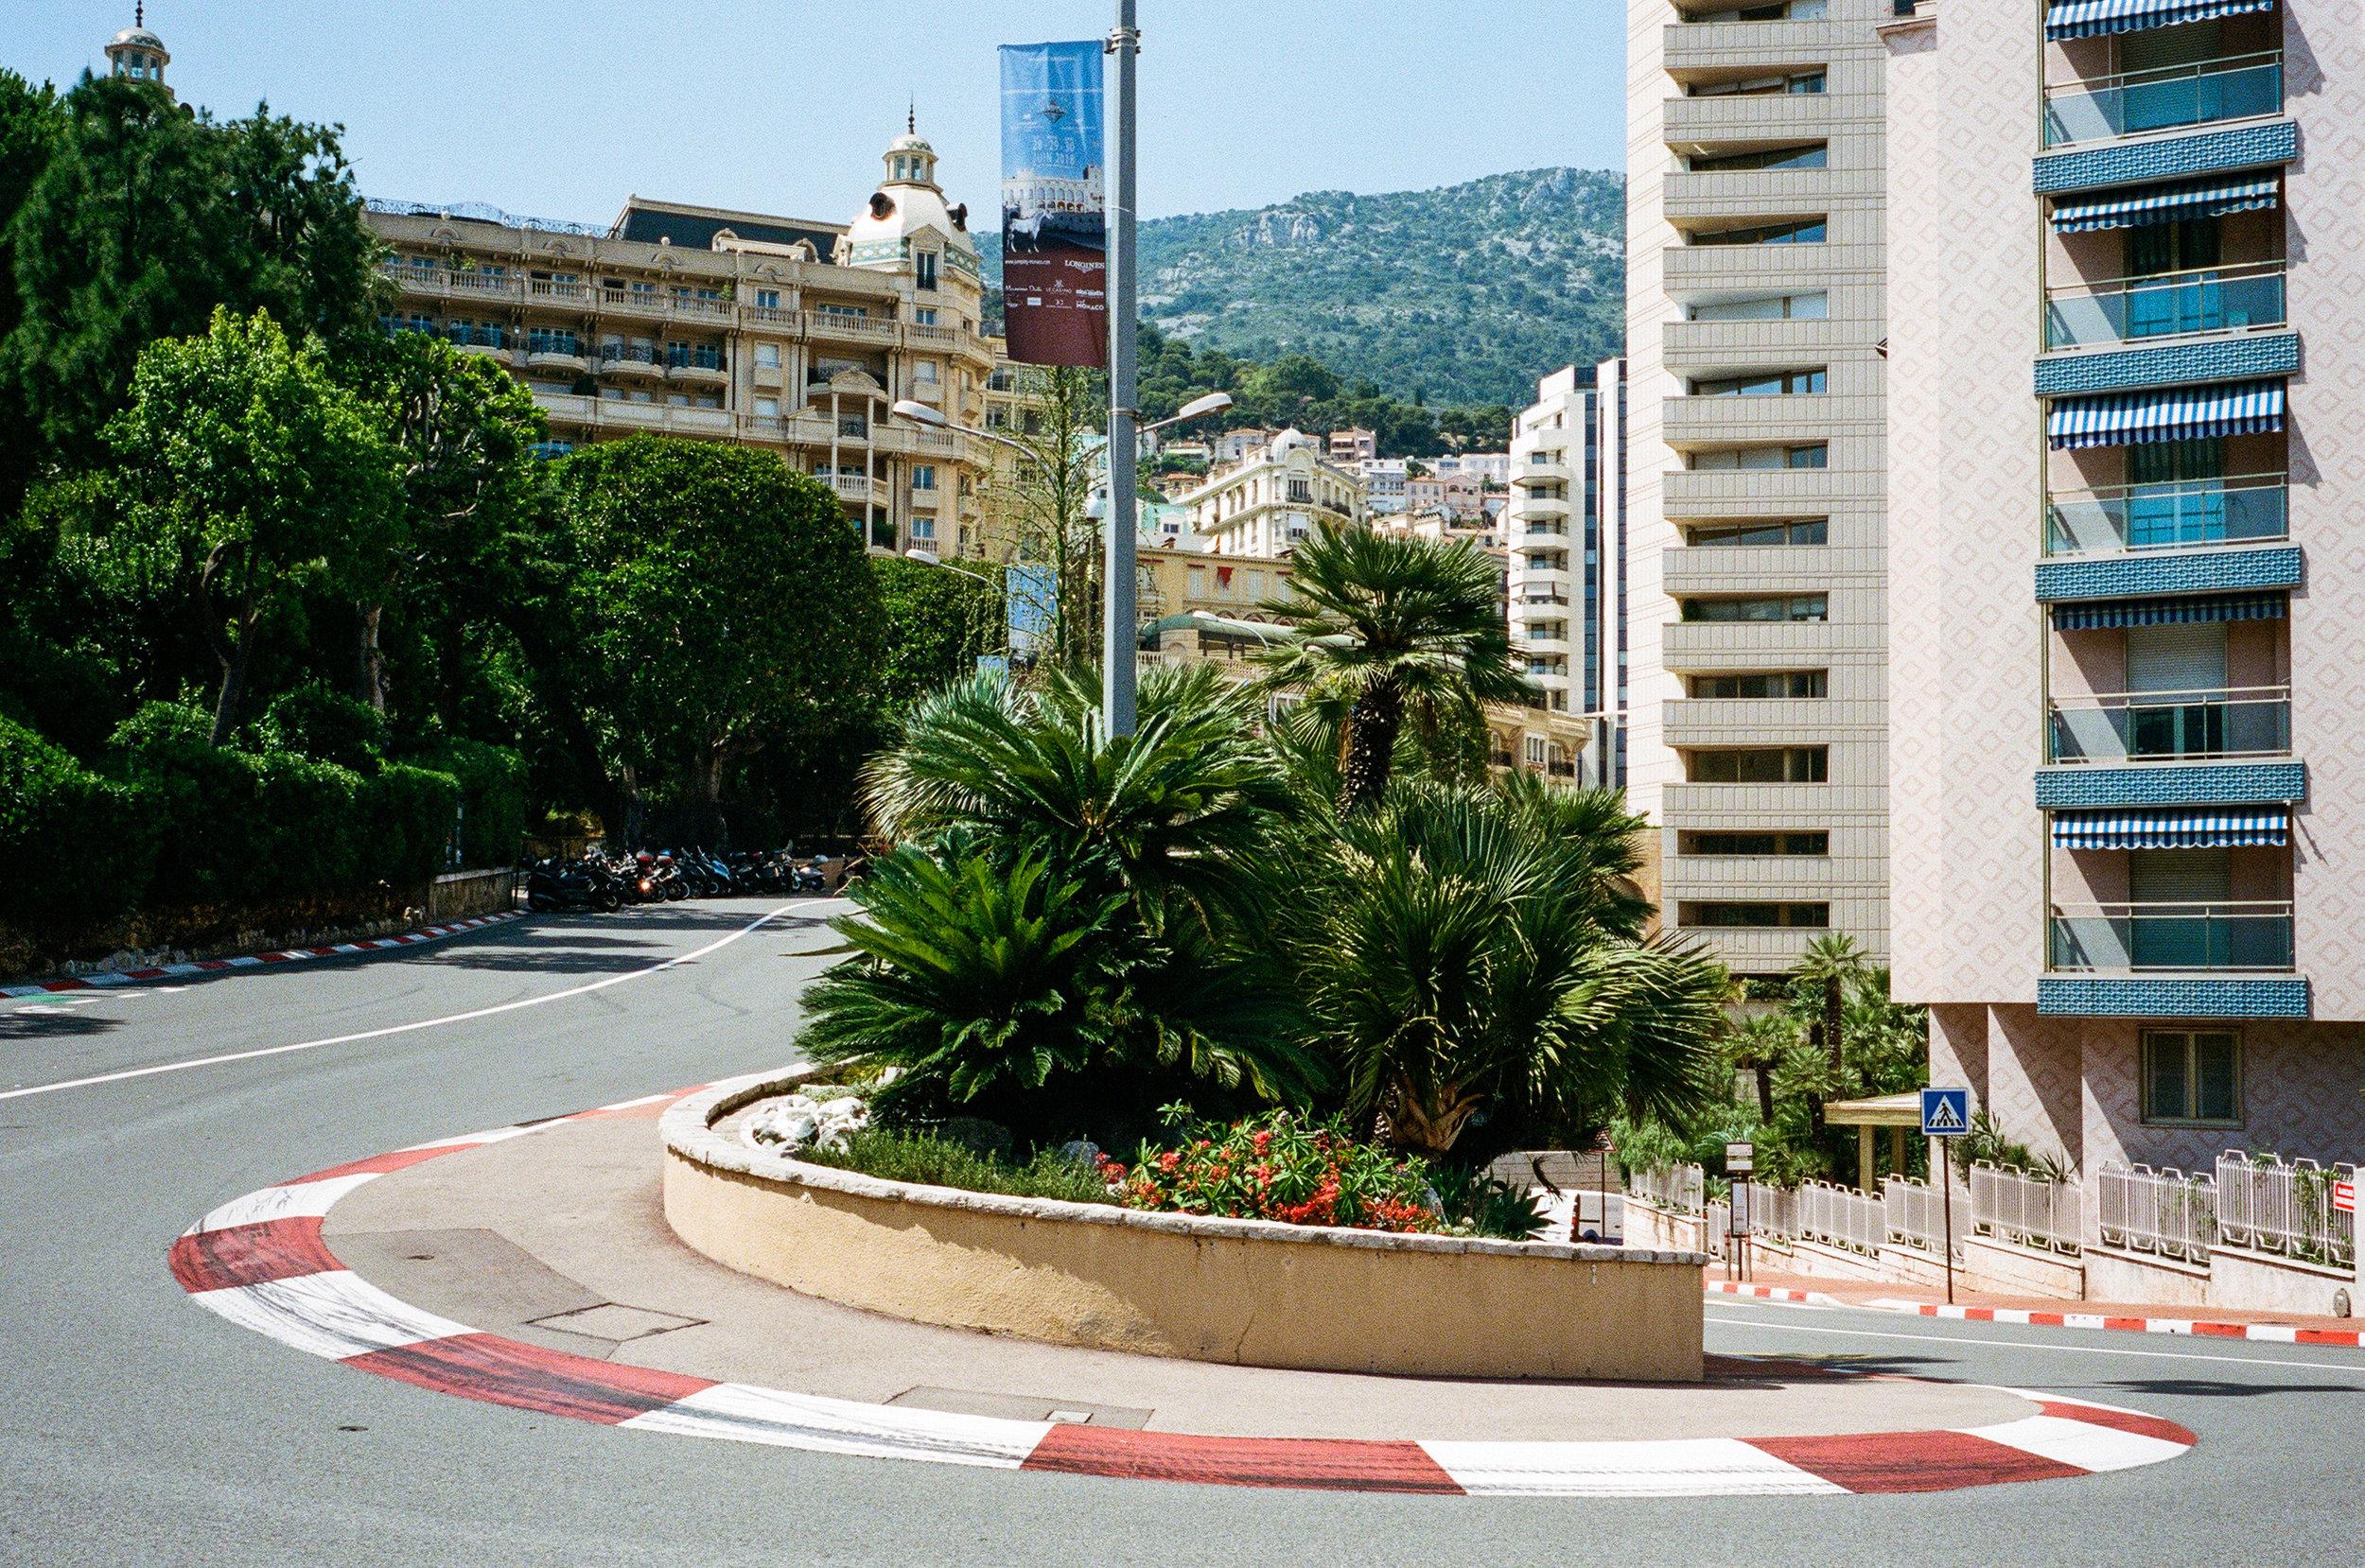 Grand Hotel Hairpin. Monaco. 2018.